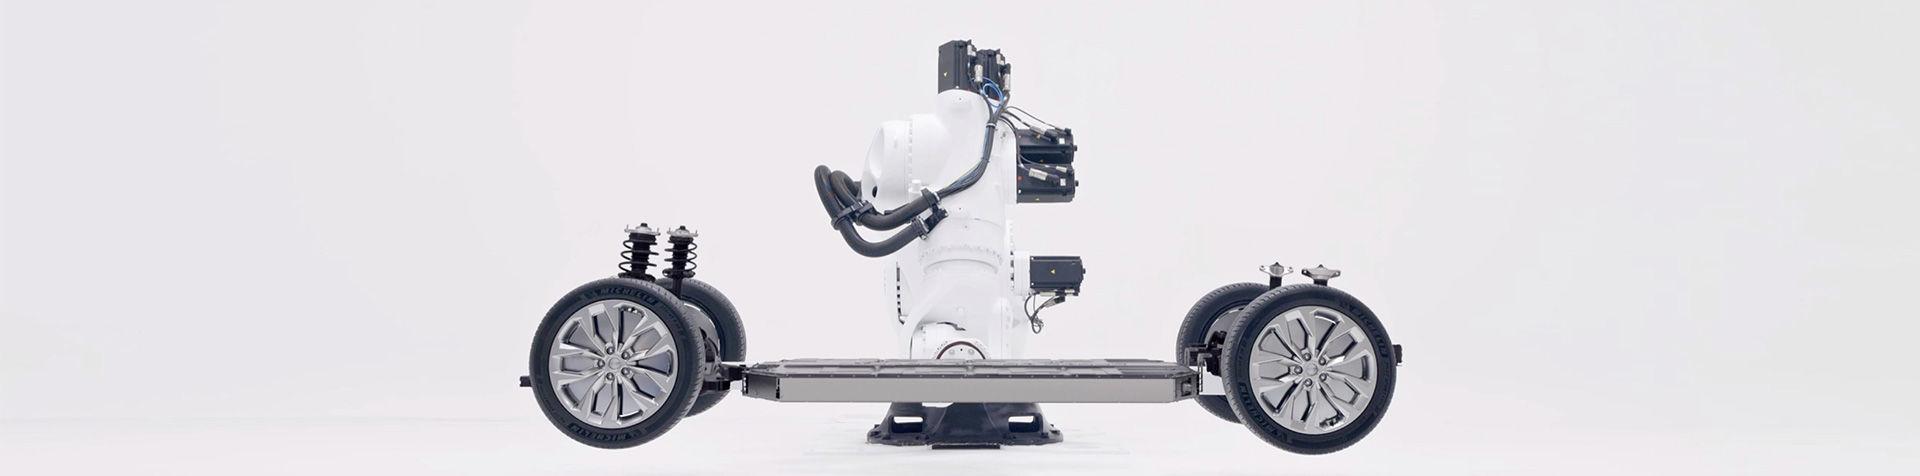 The Pump-To-Plug Revolution